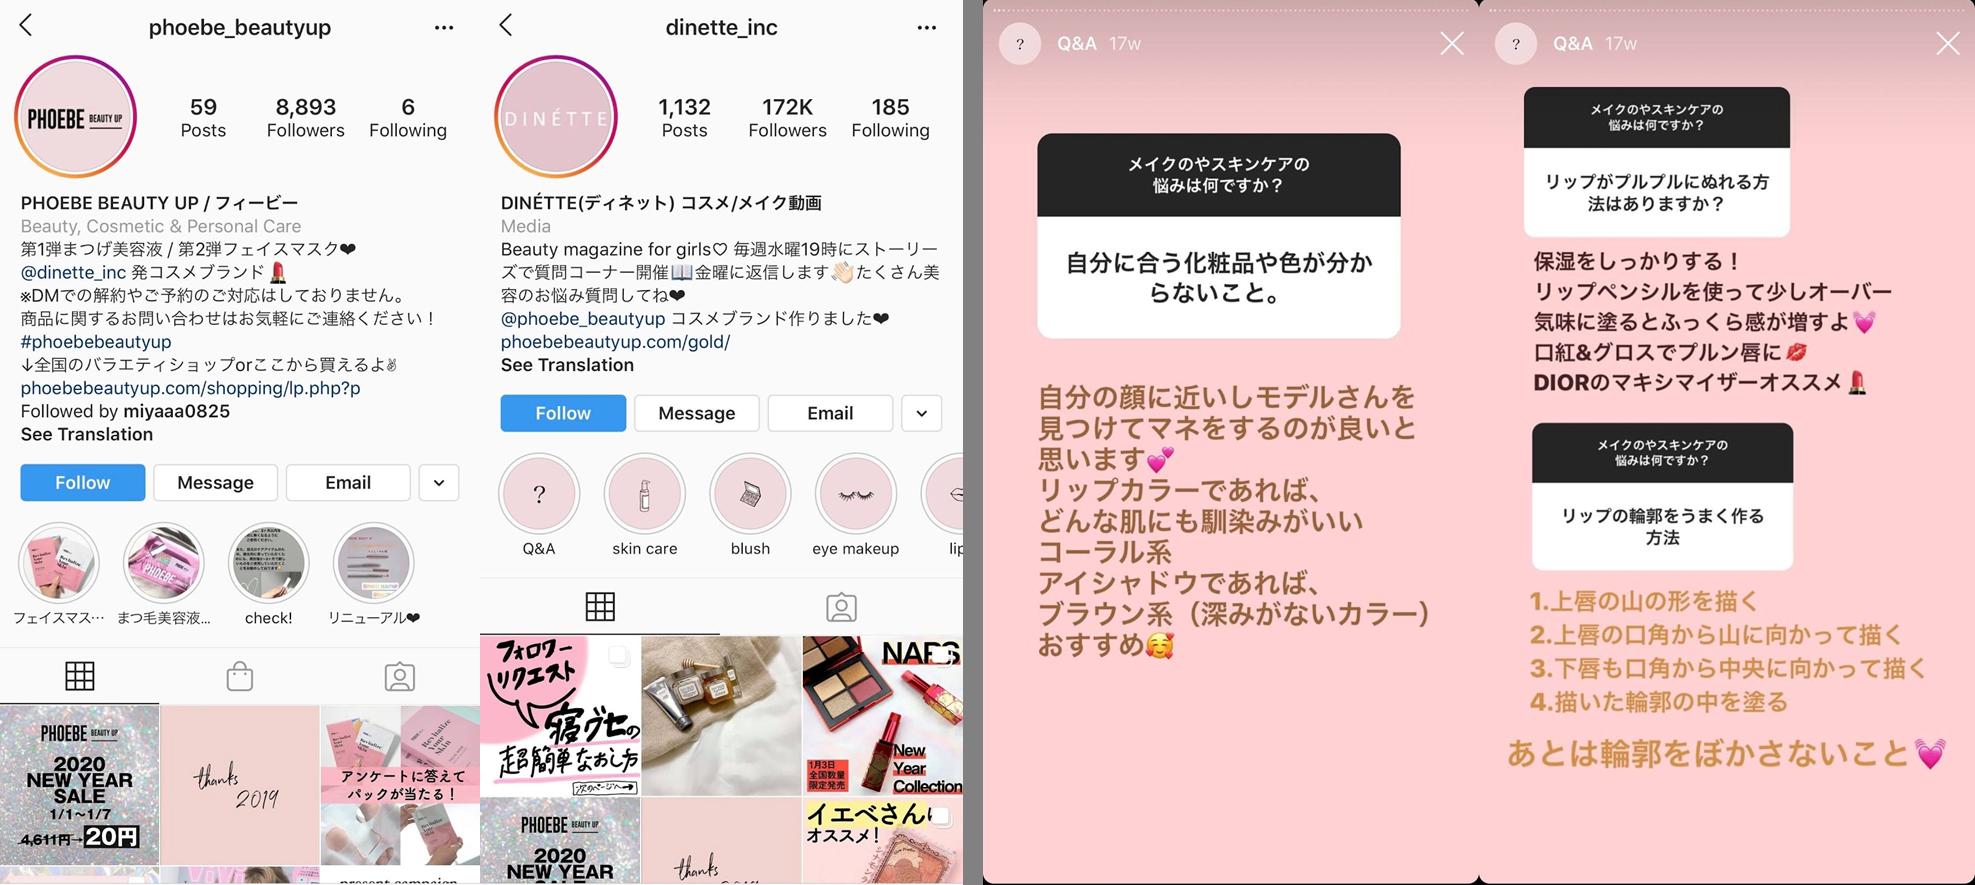 DINETTE Instagramアカウント